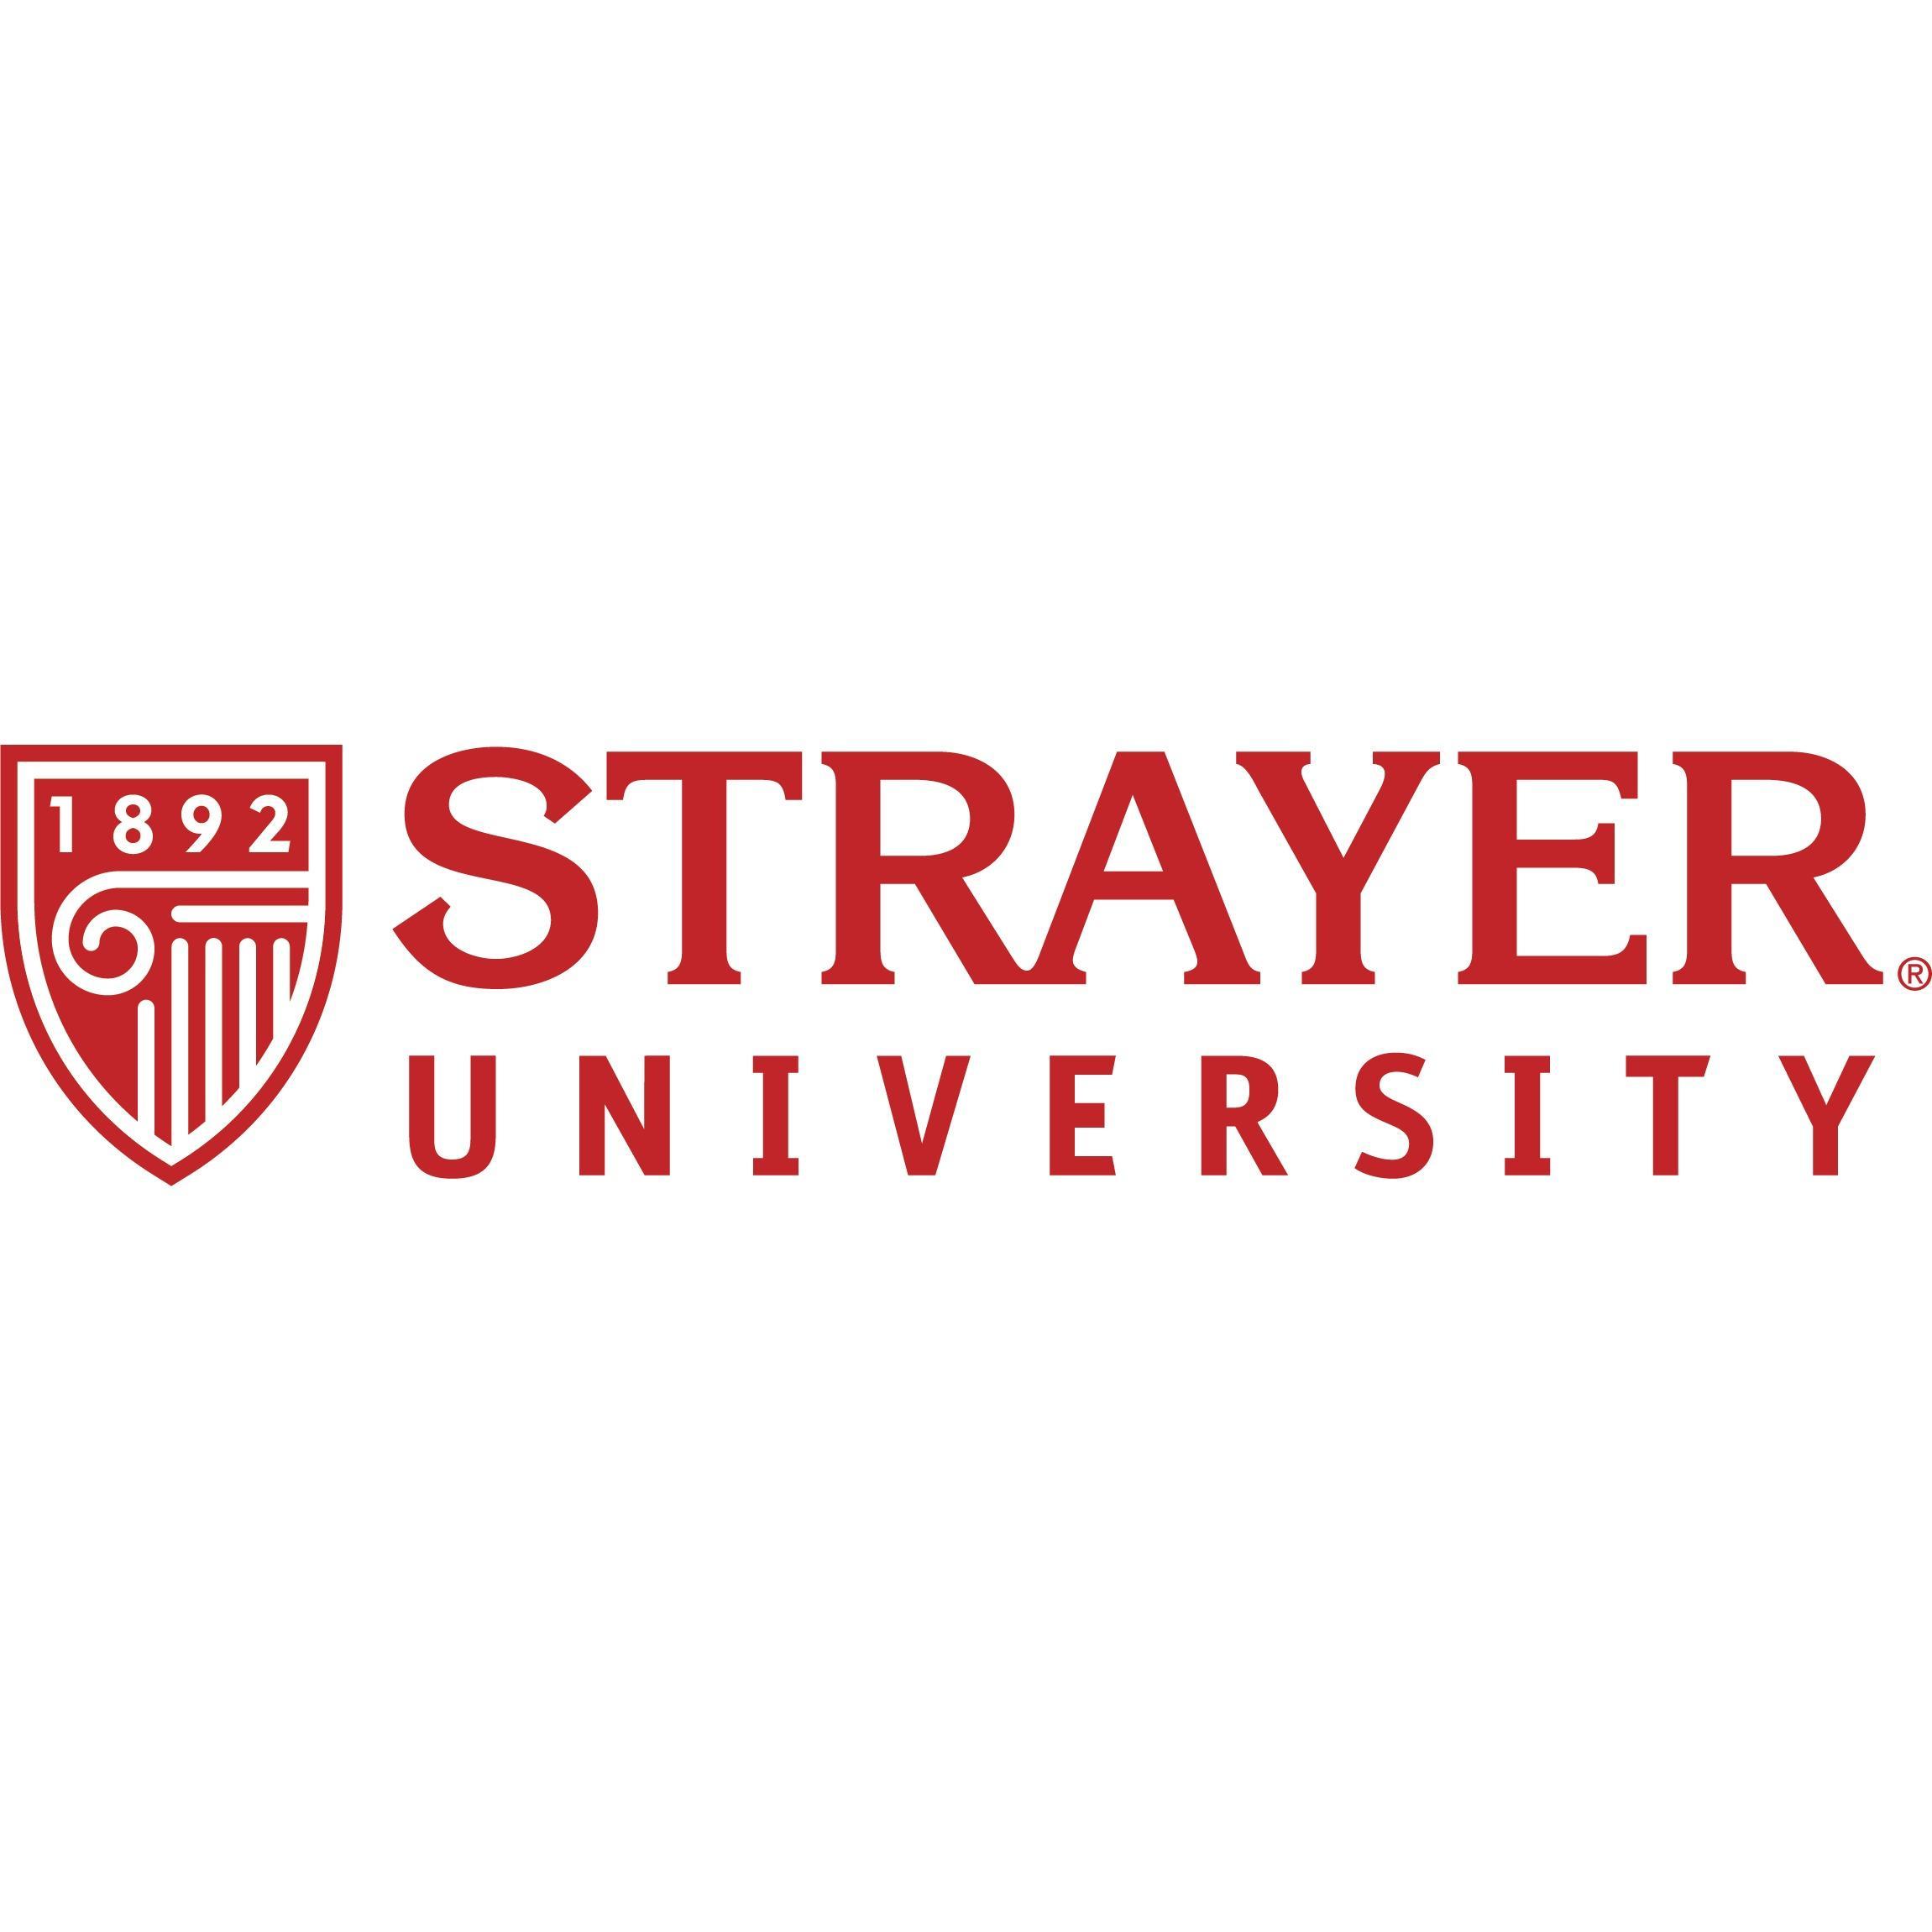 Strayer University image 77